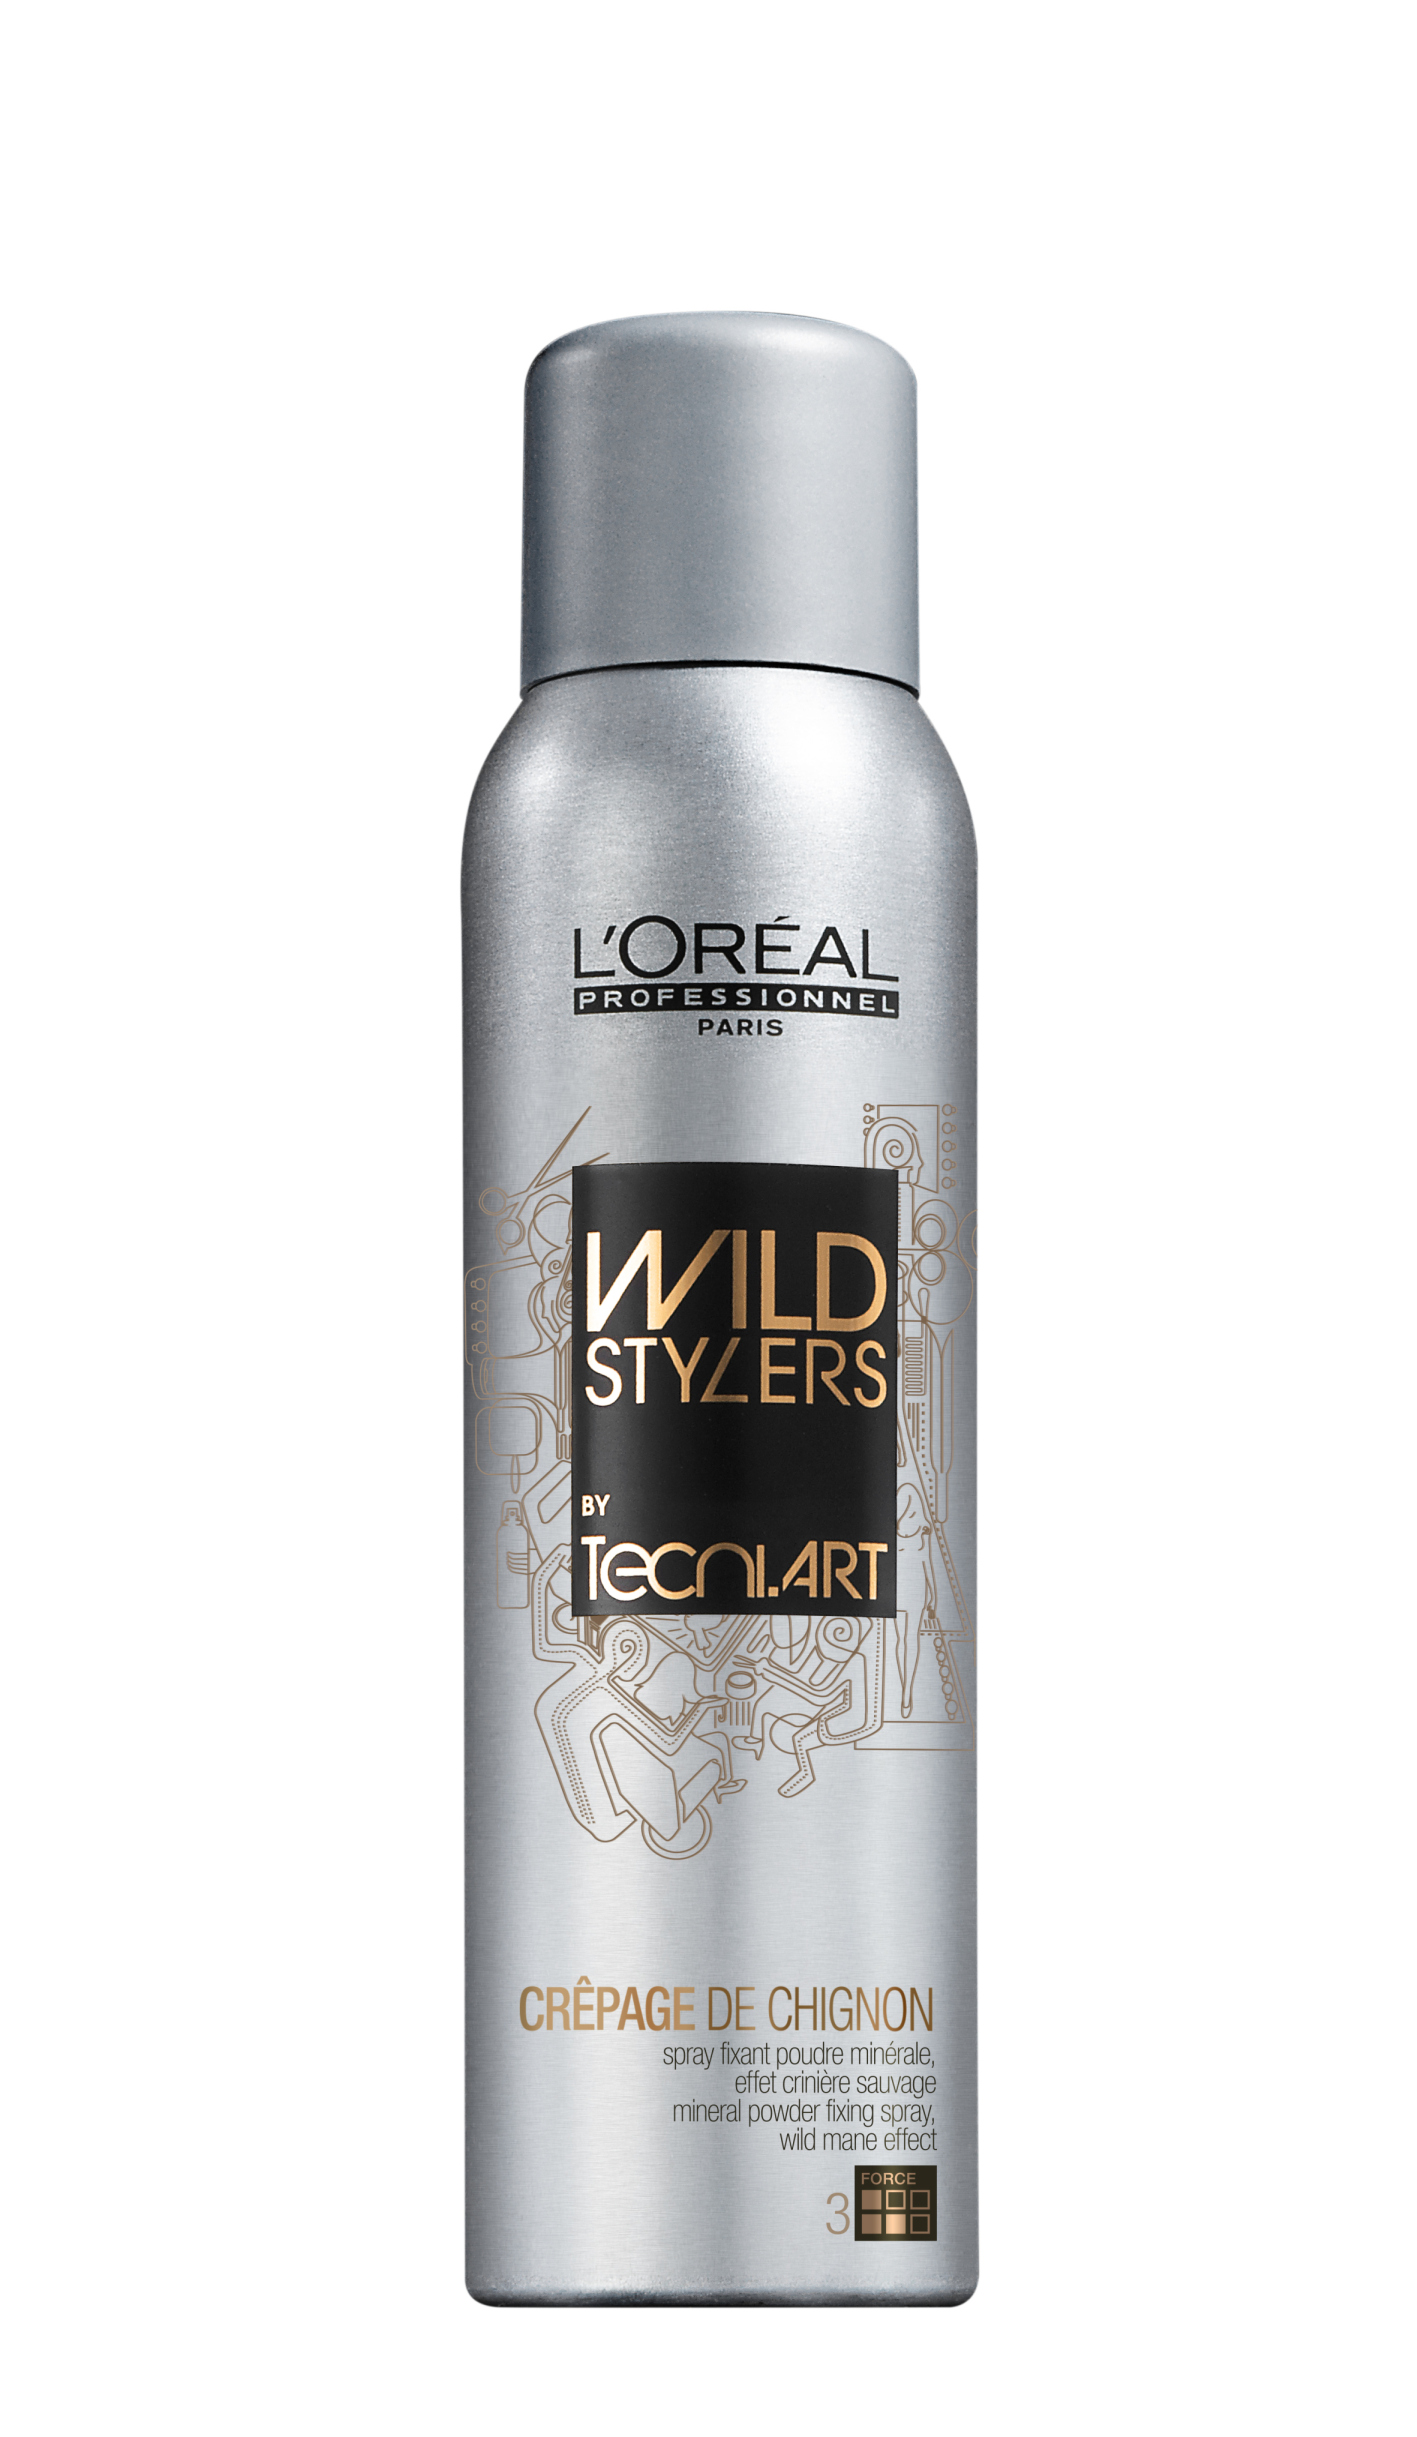 L'Oréal Professionnel Tecni.Art Wild Stylers Crêpage de Chignon RRP$34.50